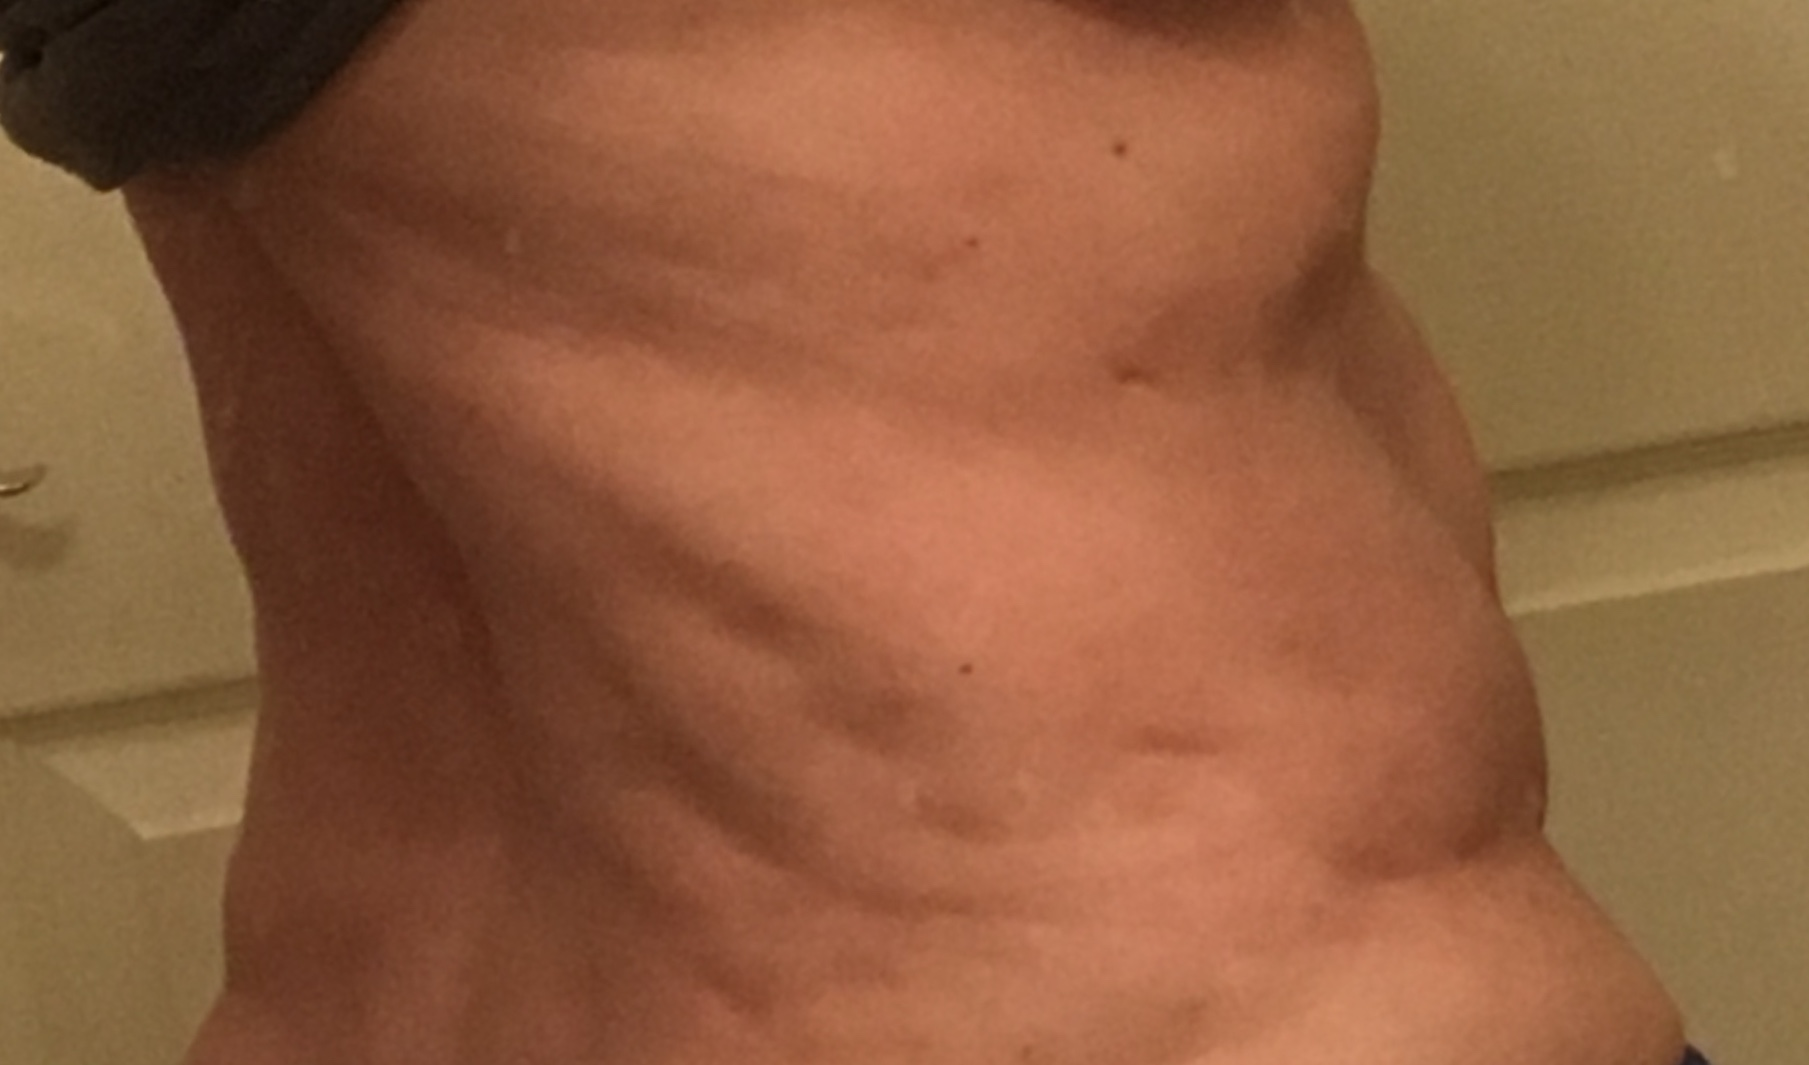 sonobello pierdere în greutate recenzii